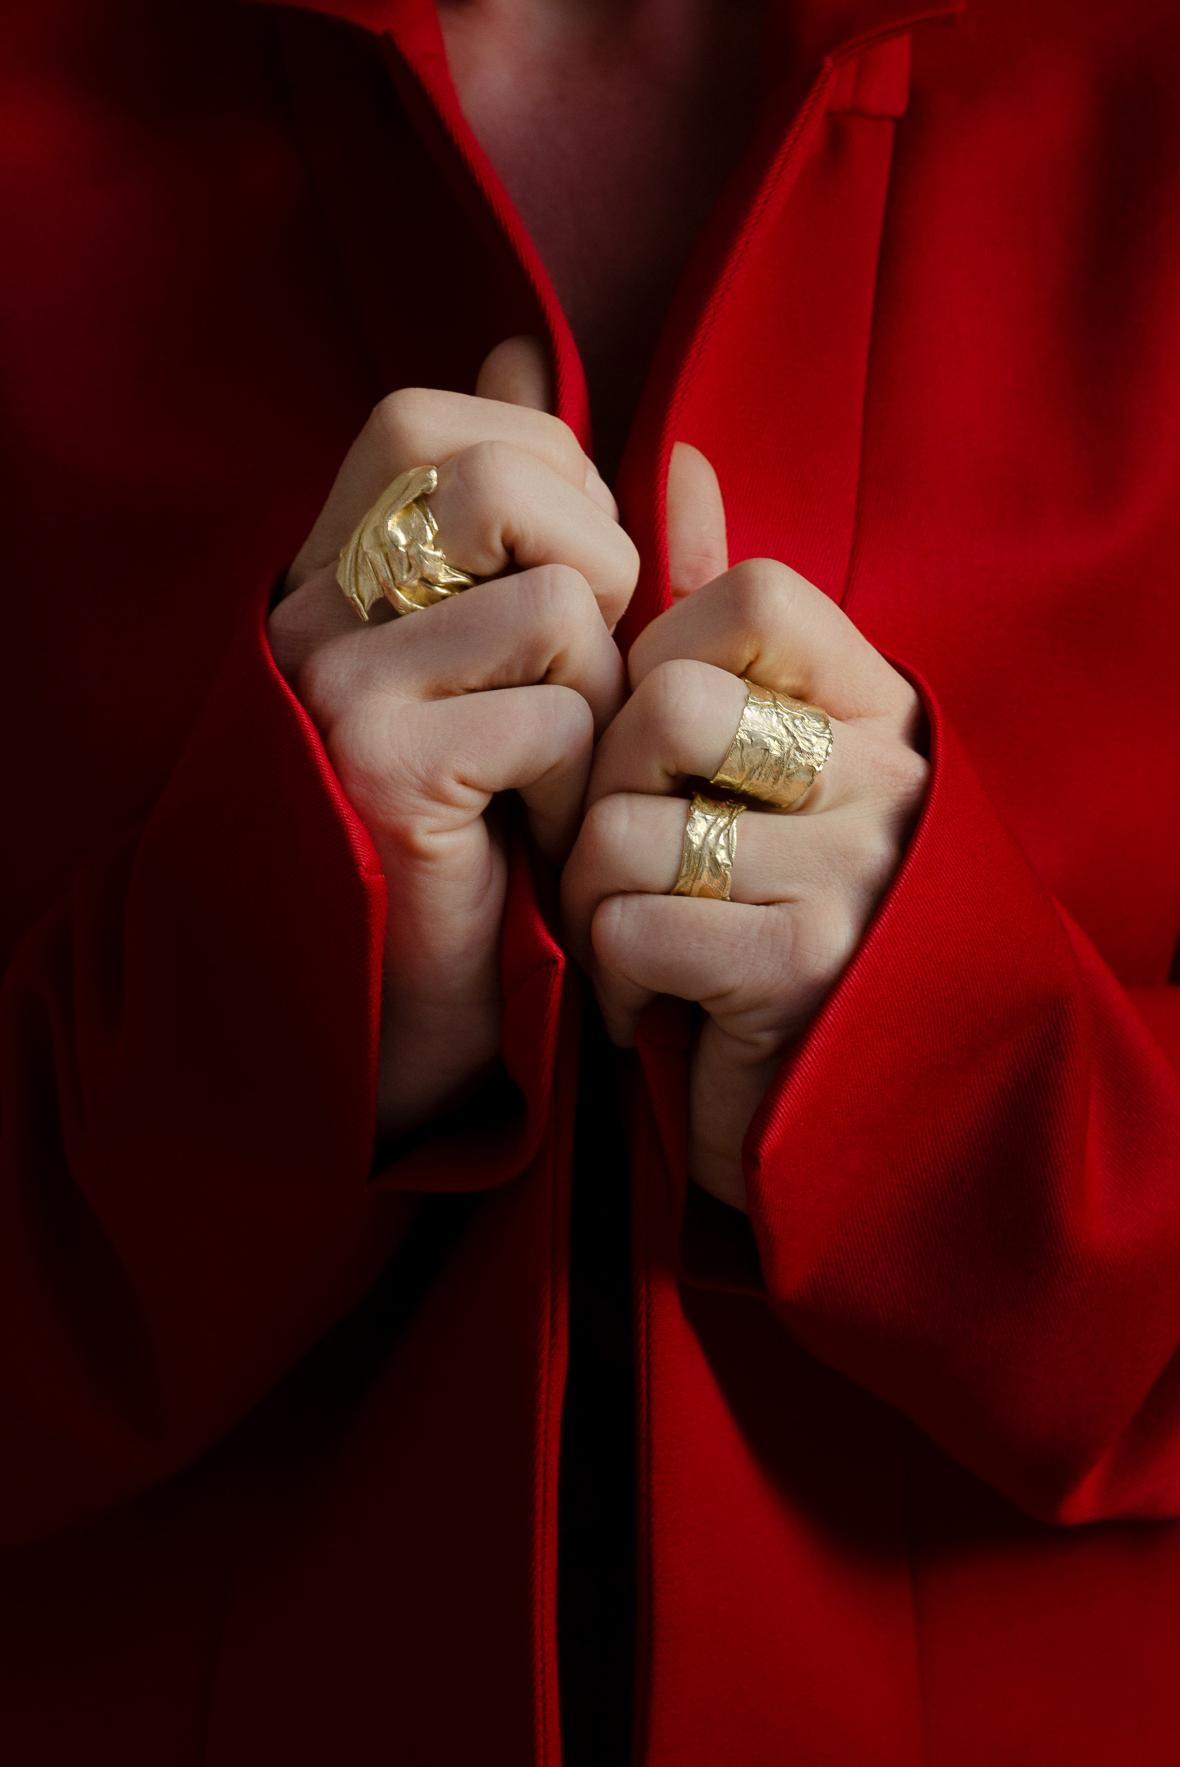 Šperky (Lenka Kerlická)